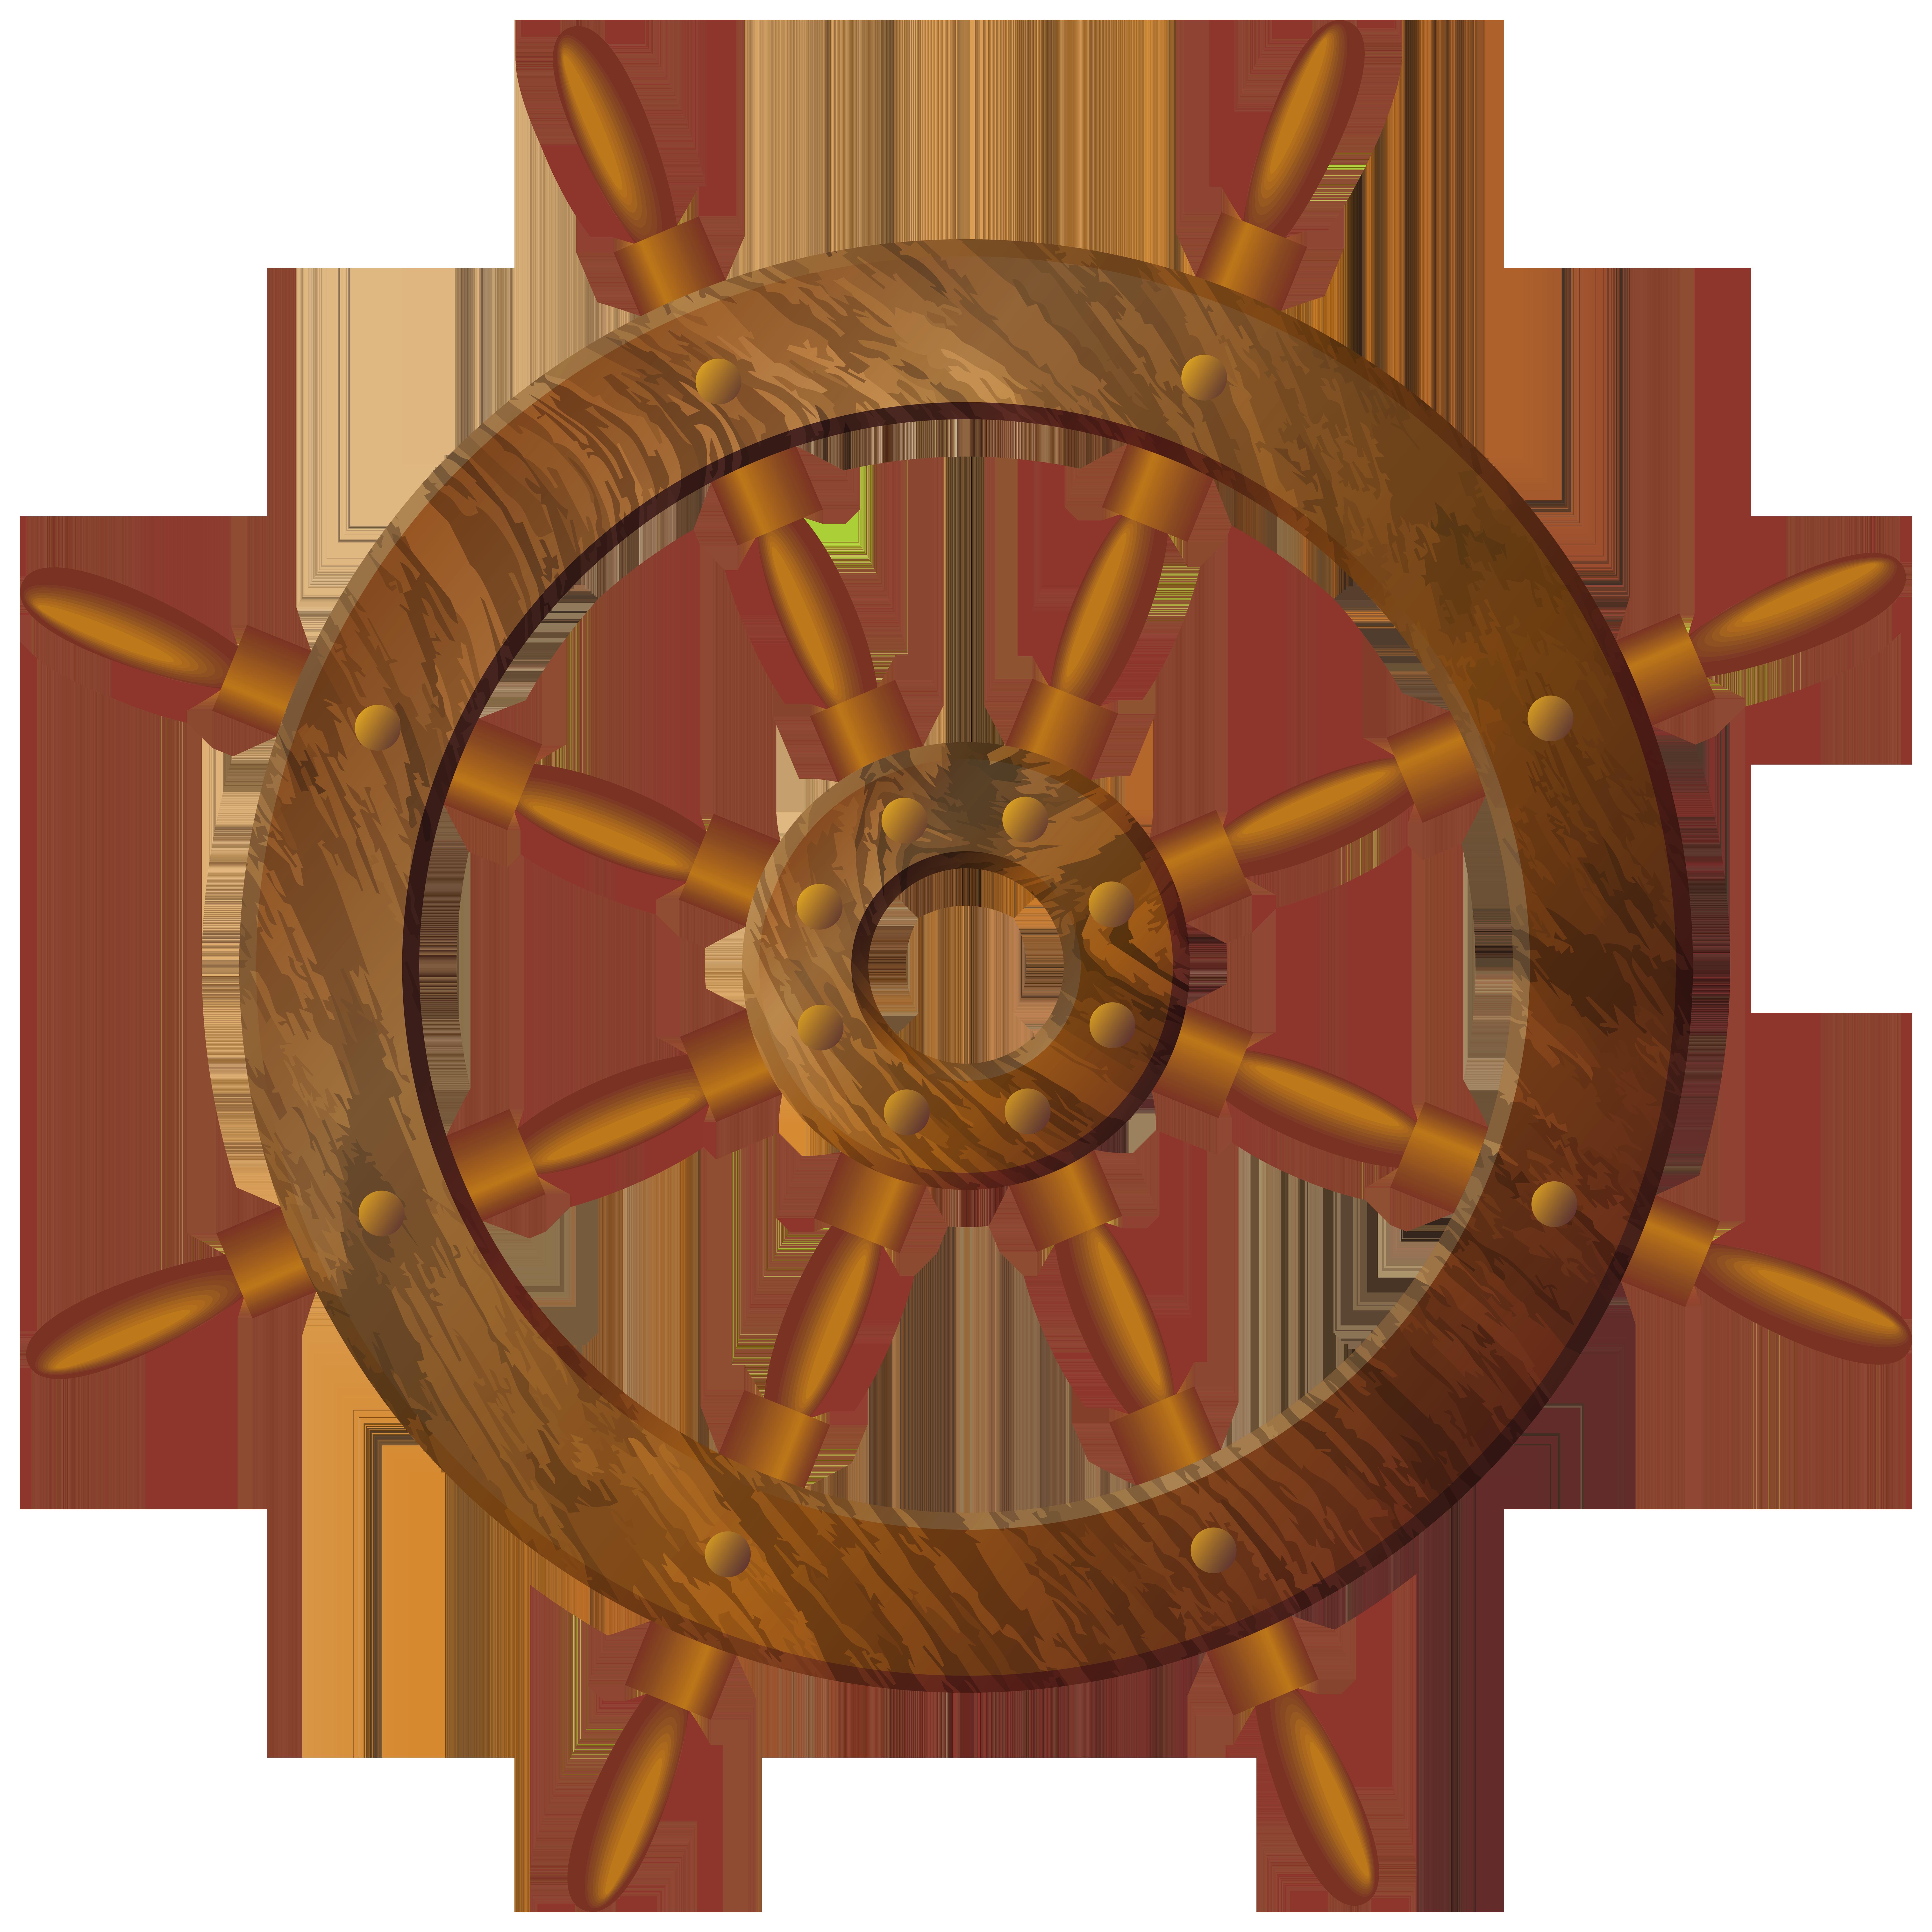 Wooden Wheel Transparent PNG Clip Art Image.